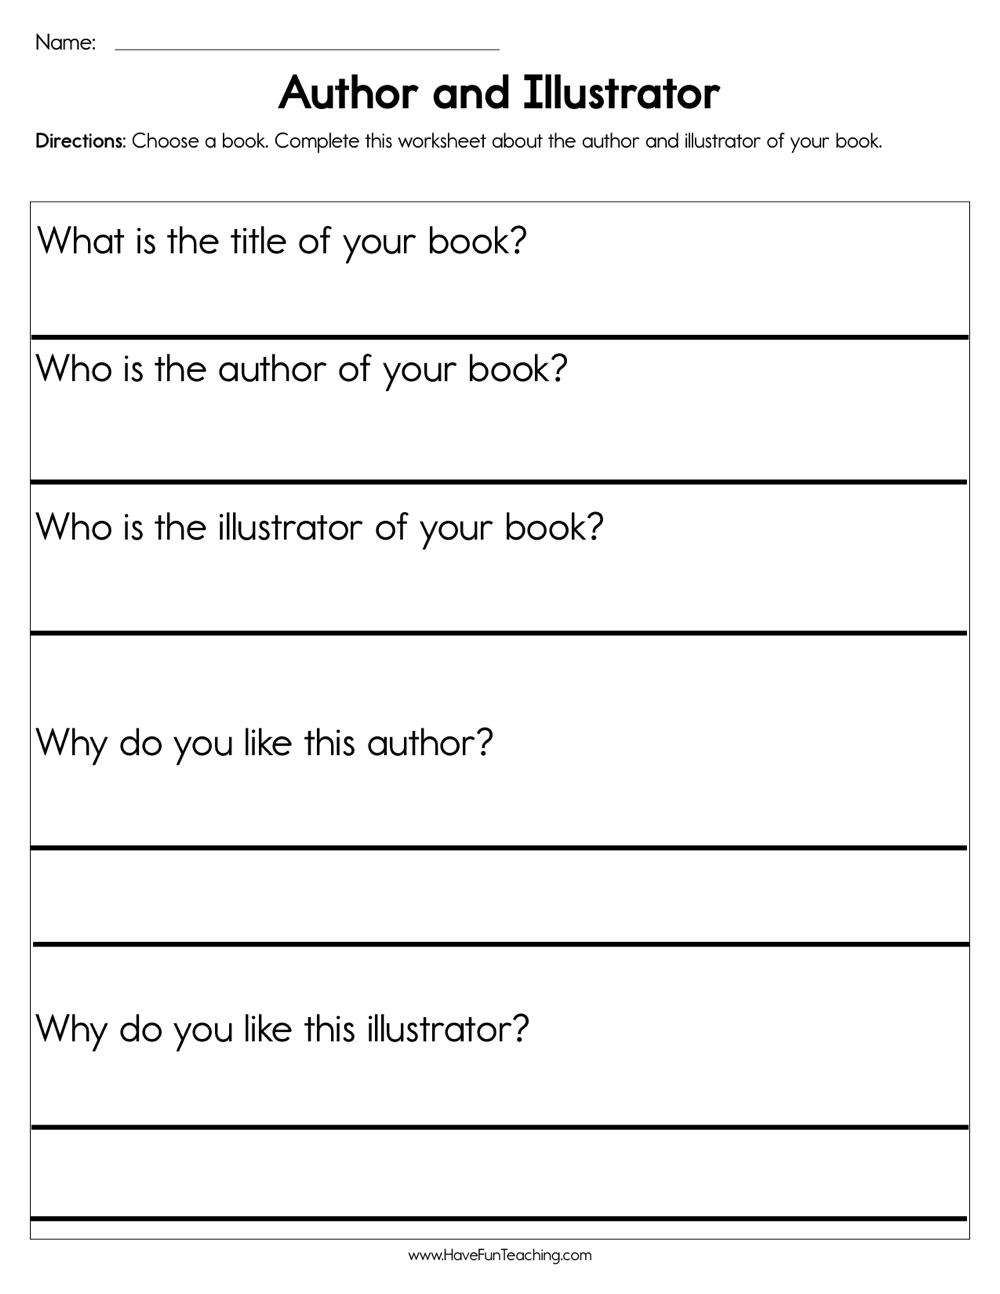 medium resolution of Author and Illustrator Worksheet • Have Fun Teaching